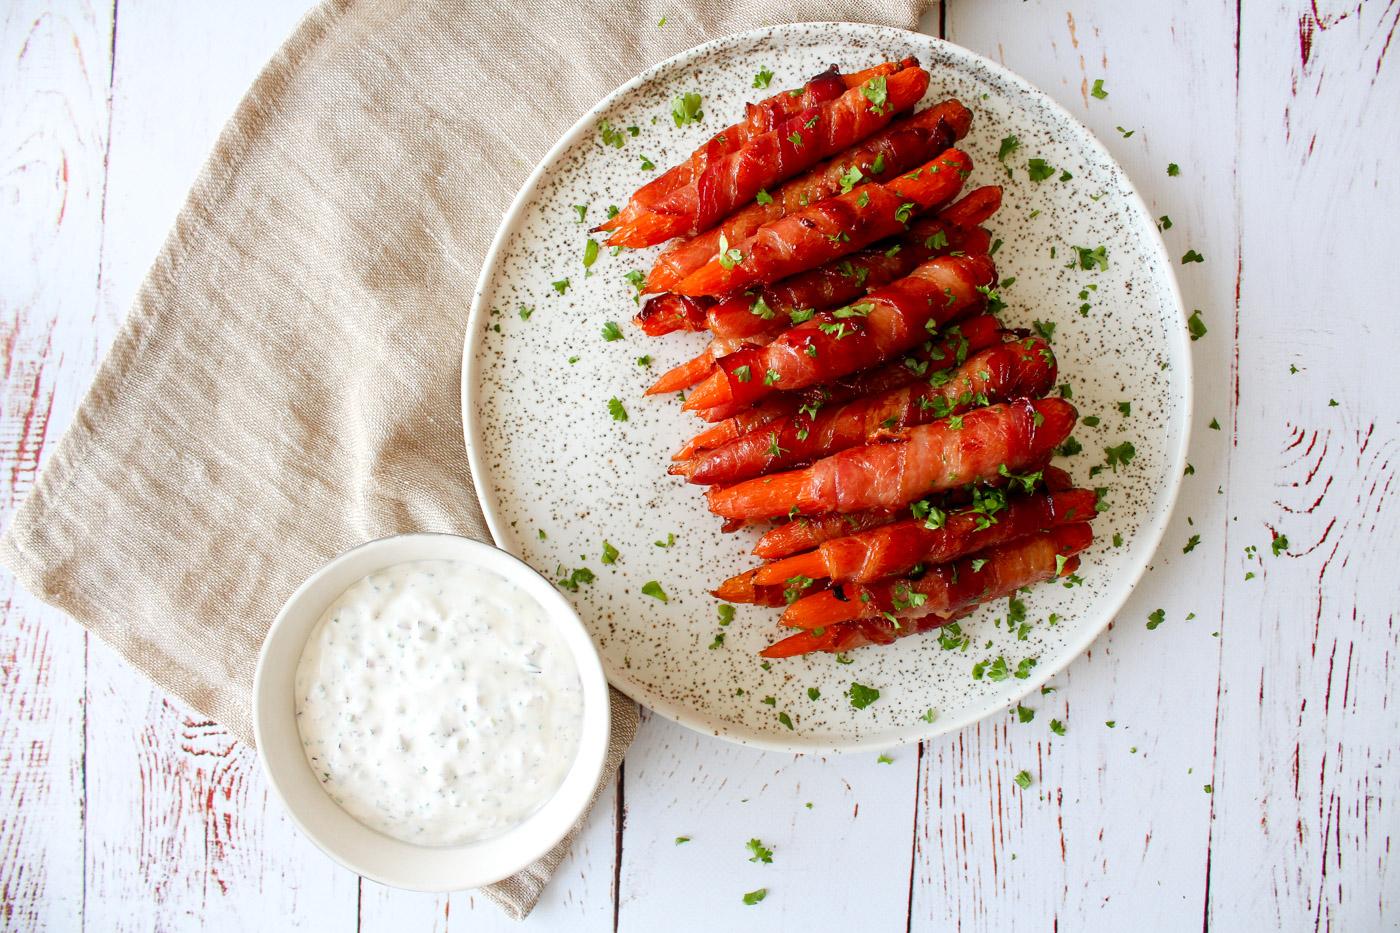 Gulerødder Med Bacon Og Honning – Lækker Snack Eller Tilbehør